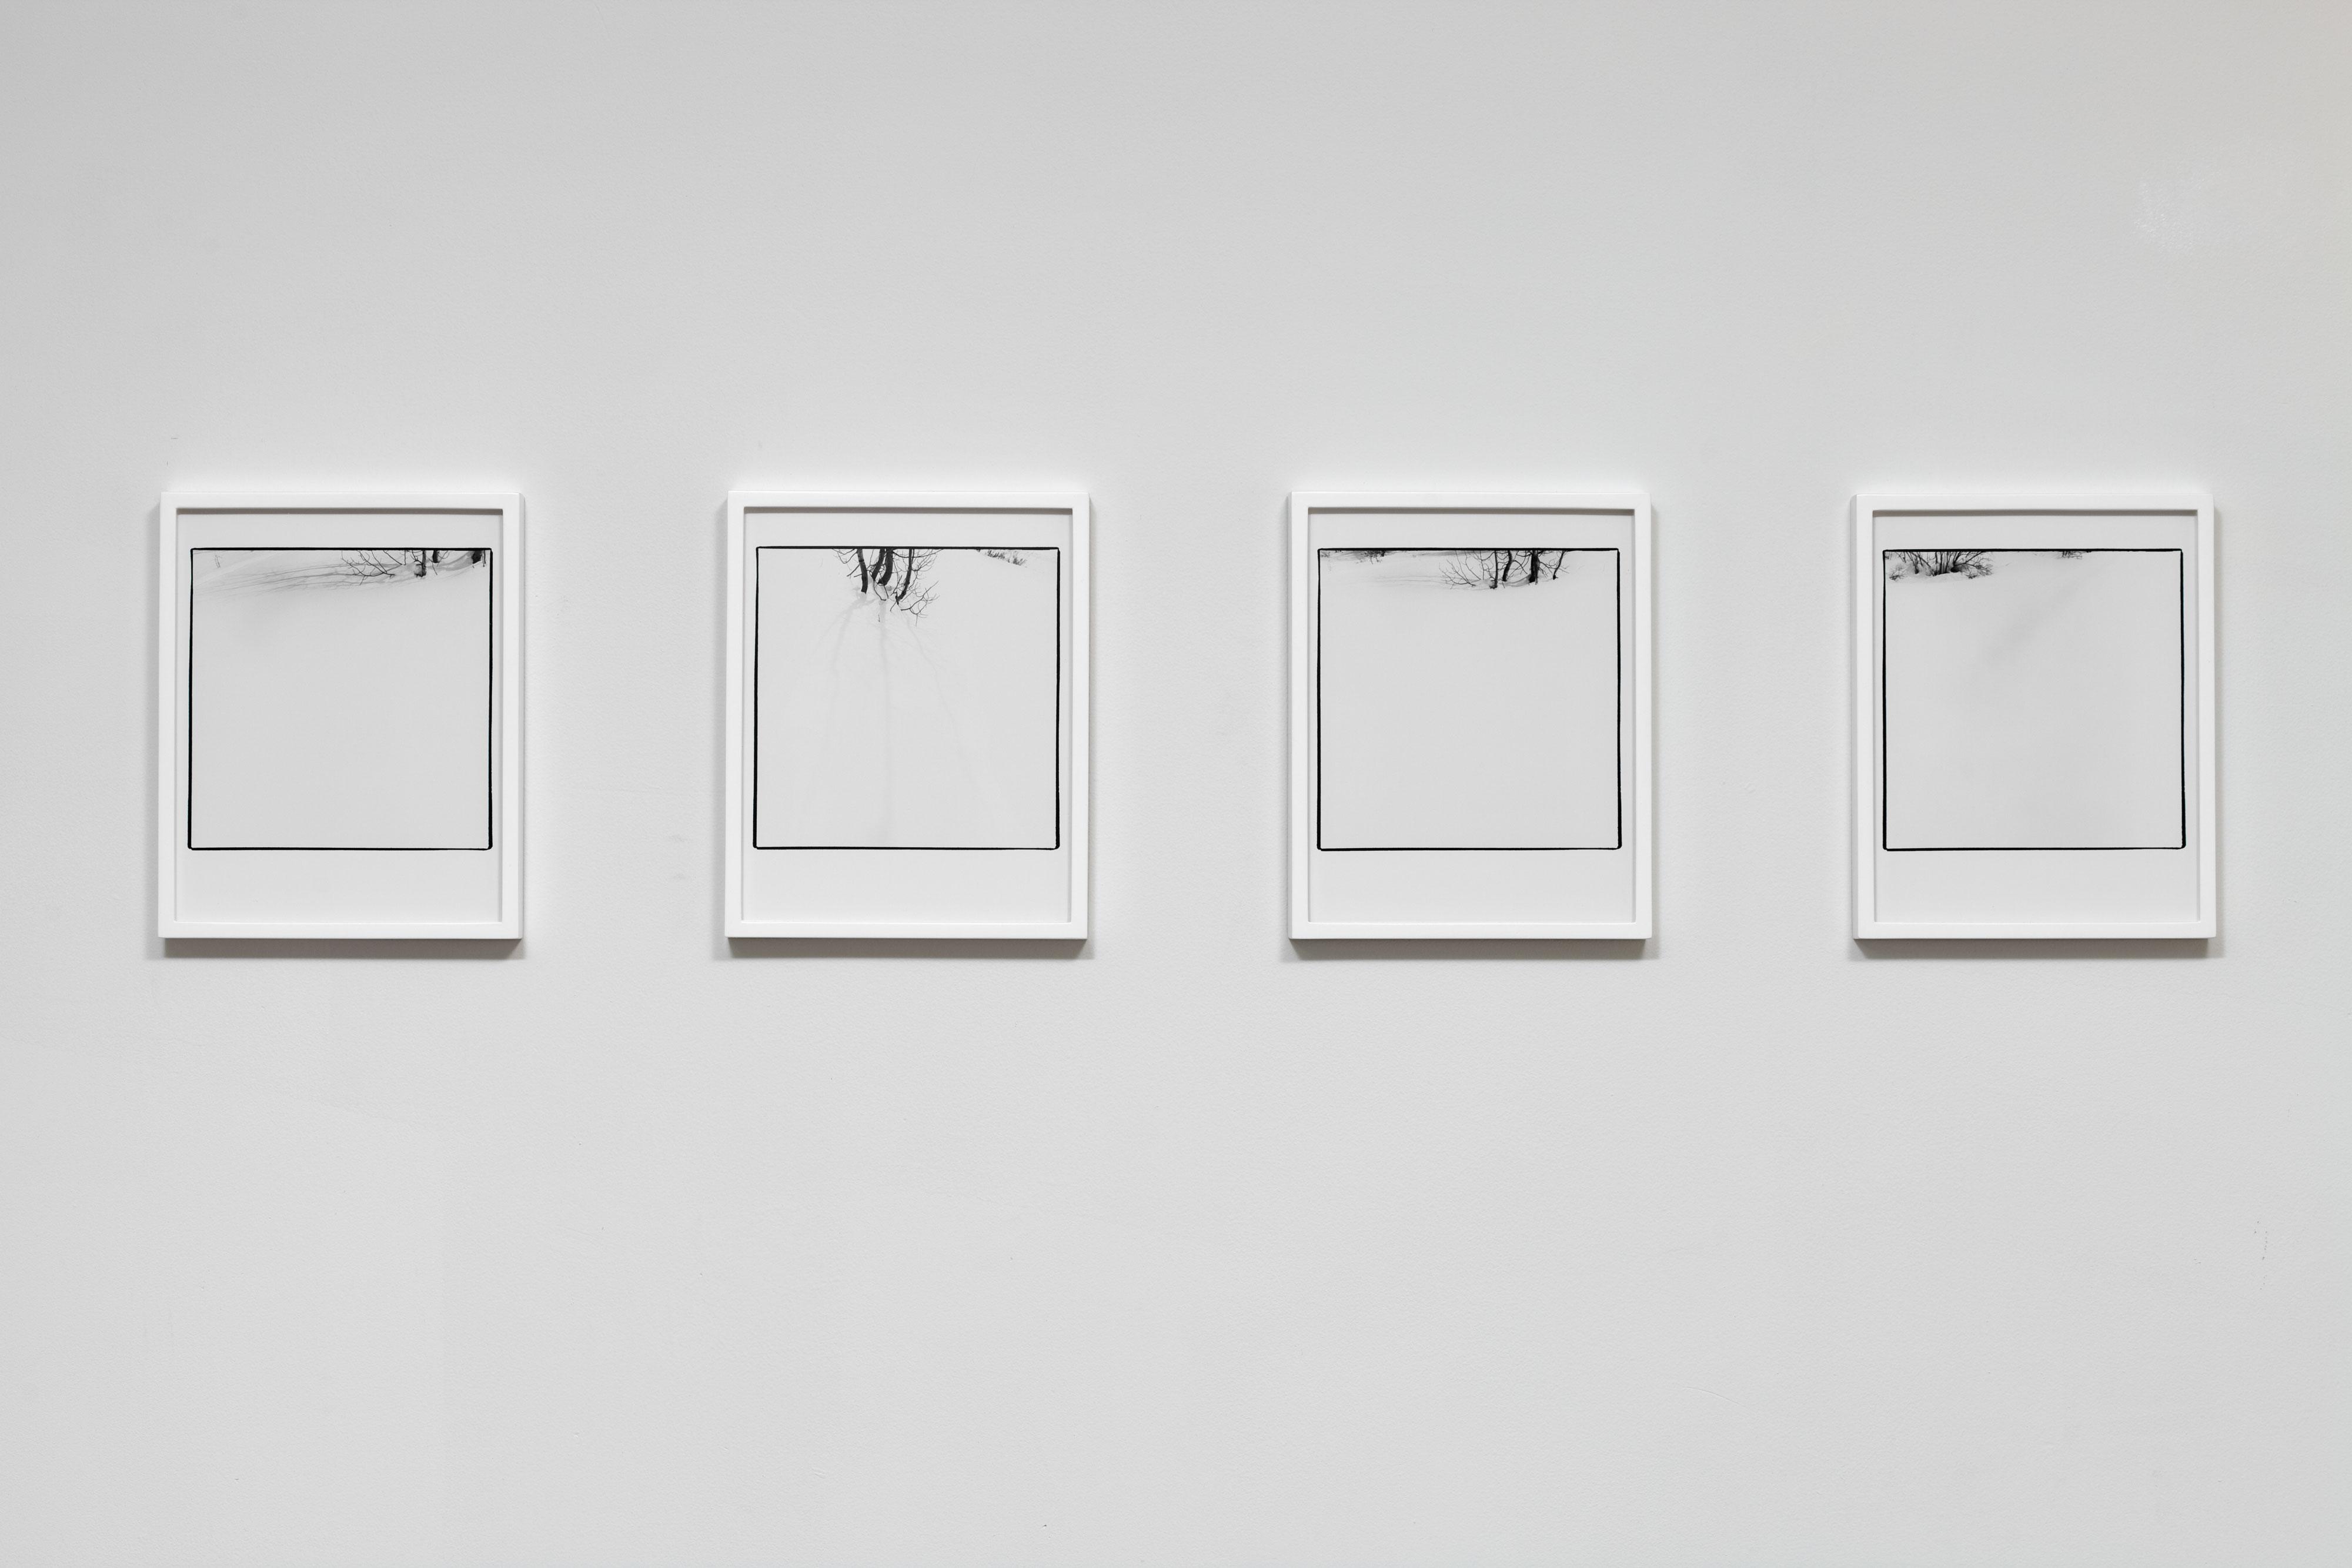 Galerie Barbara Thumm \ 1301PE@GBT \ Untitled #2, 1979-82 (2010)